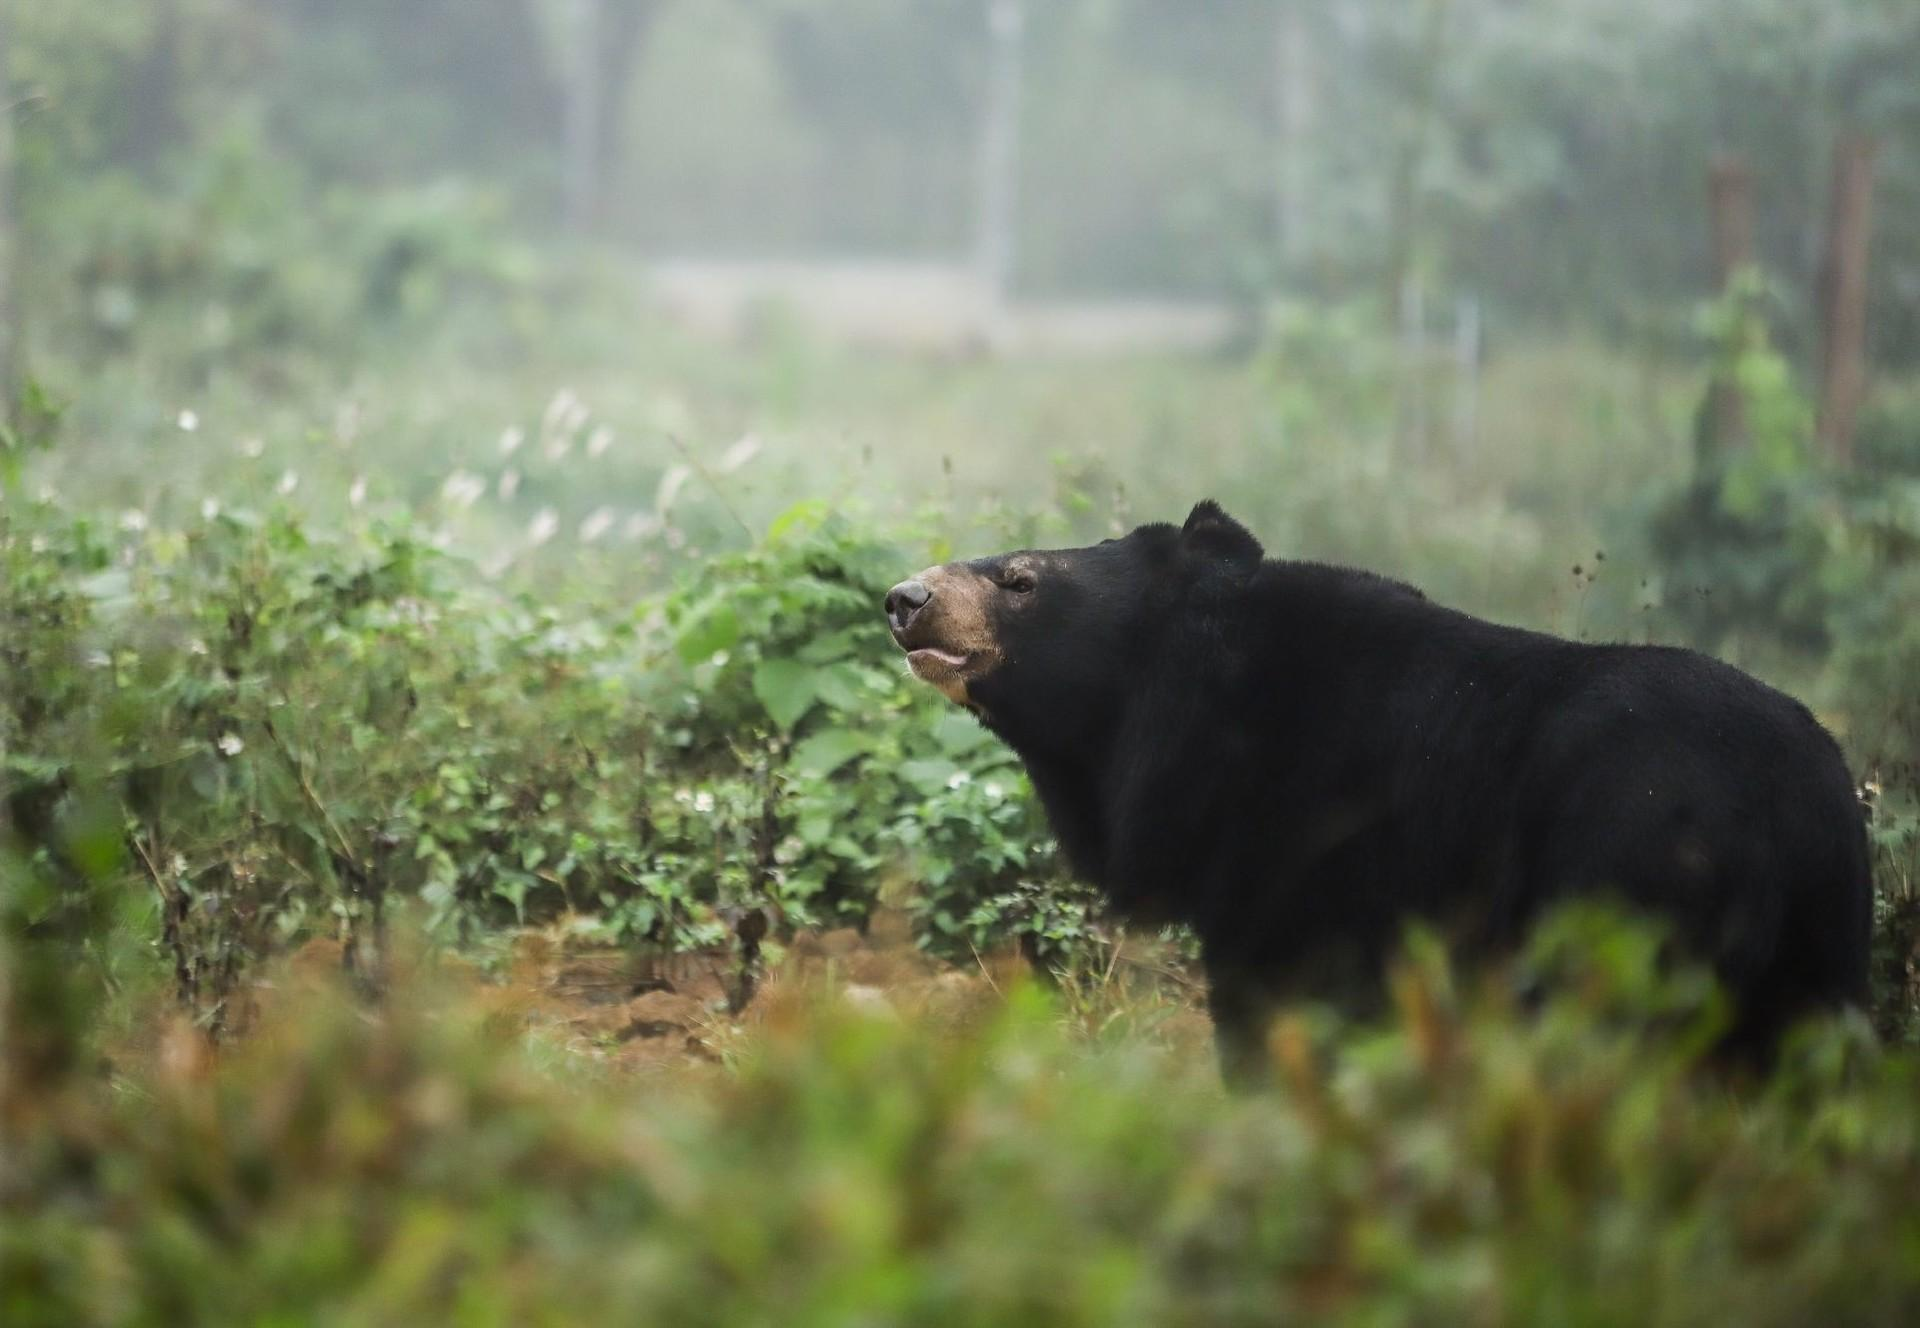 Bear at BEAR SANCTUARY Nihn Binh